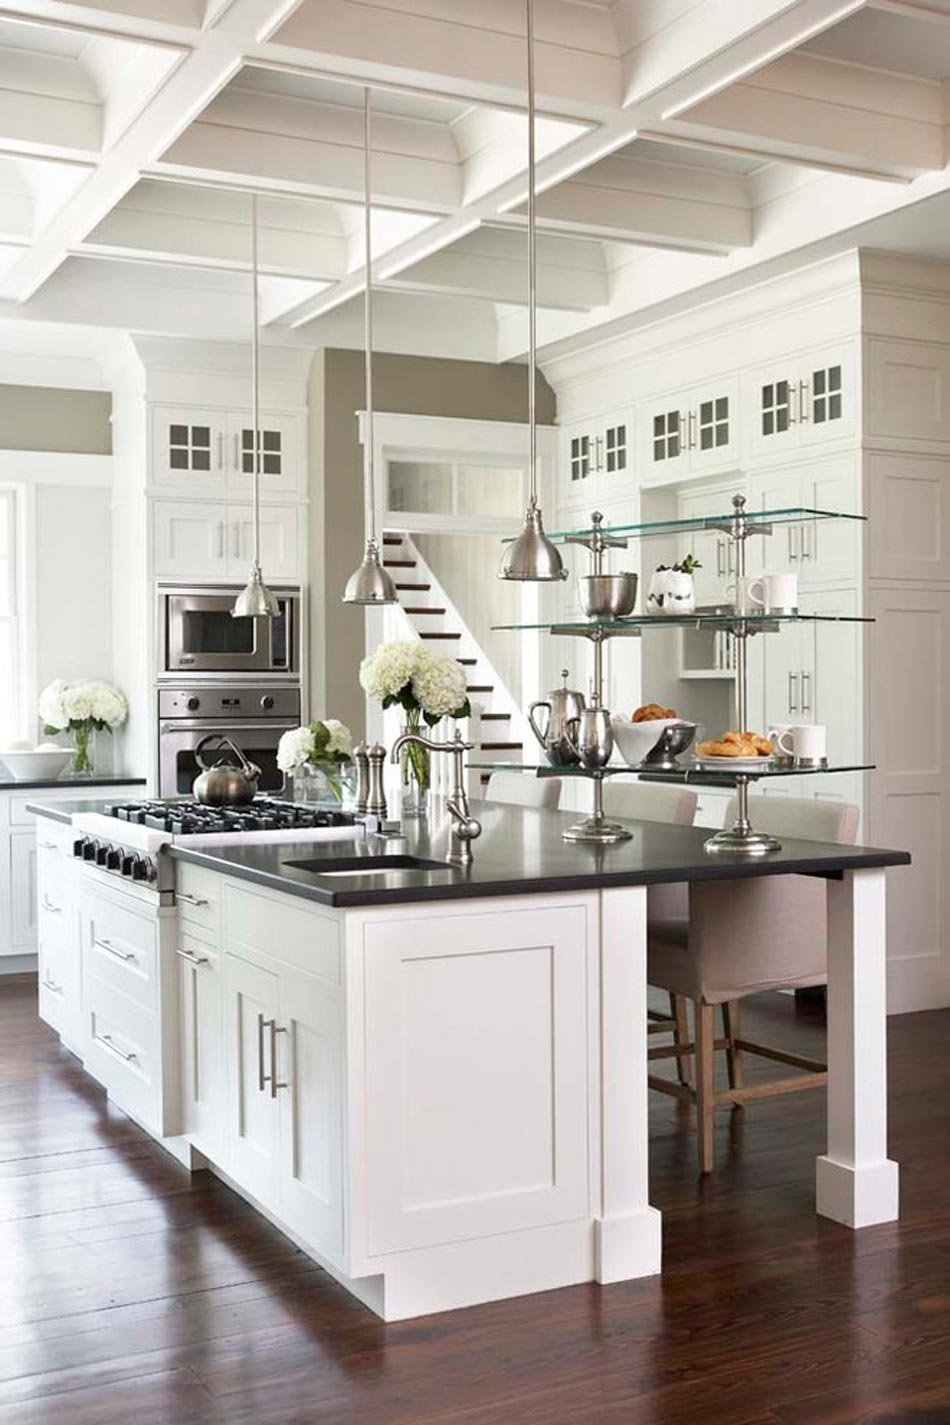 comptoir de granit le visage moderne de nos cuisines design feria. Black Bedroom Furniture Sets. Home Design Ideas